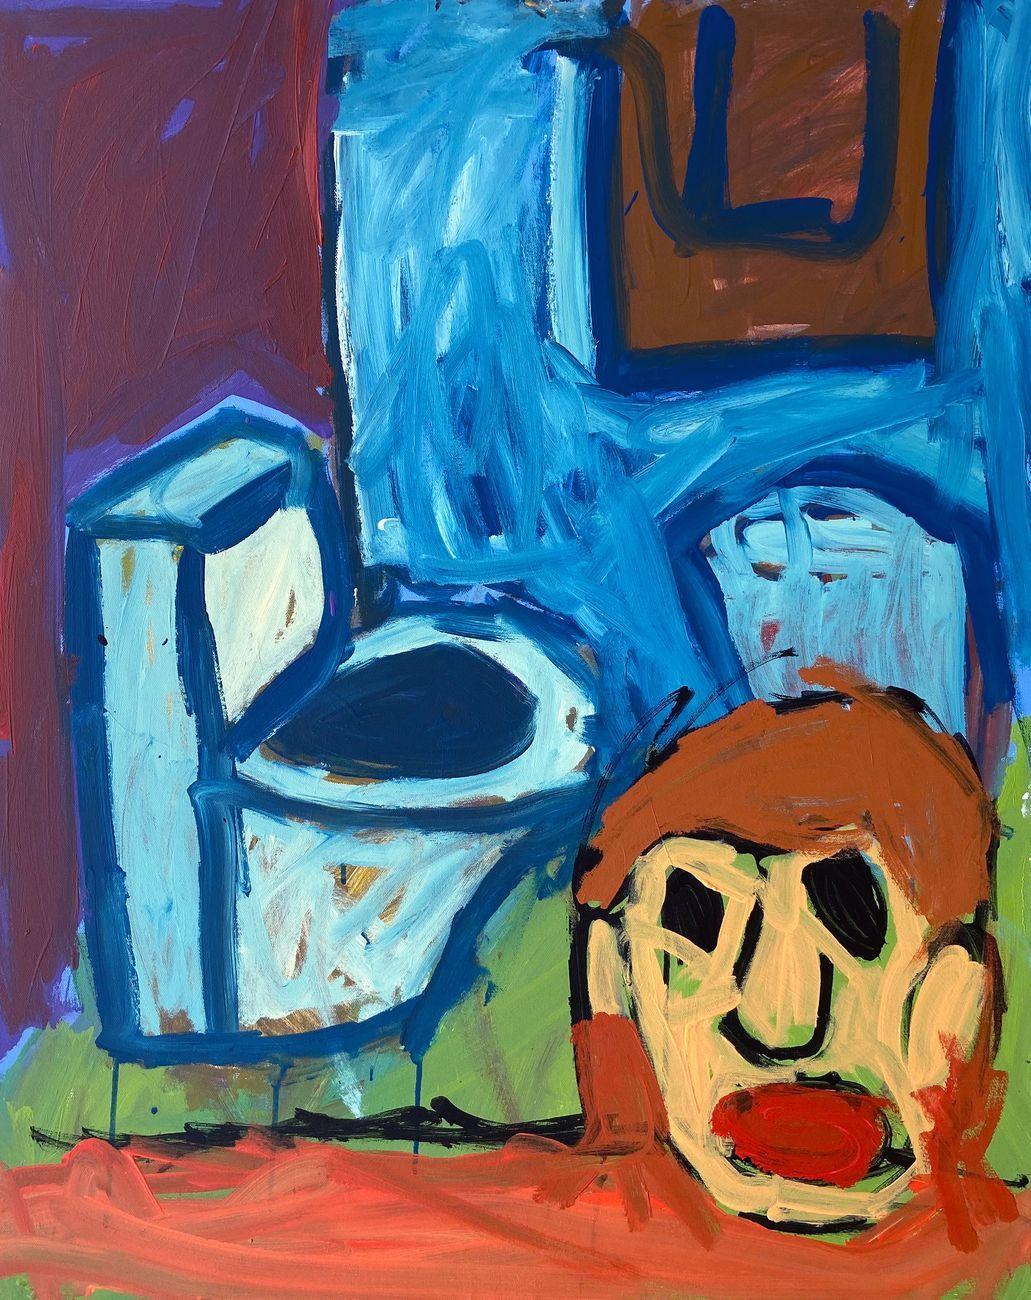 Matteo Cordero, Blue Toilet, 2020, acrilico su tela, 100x80 cm